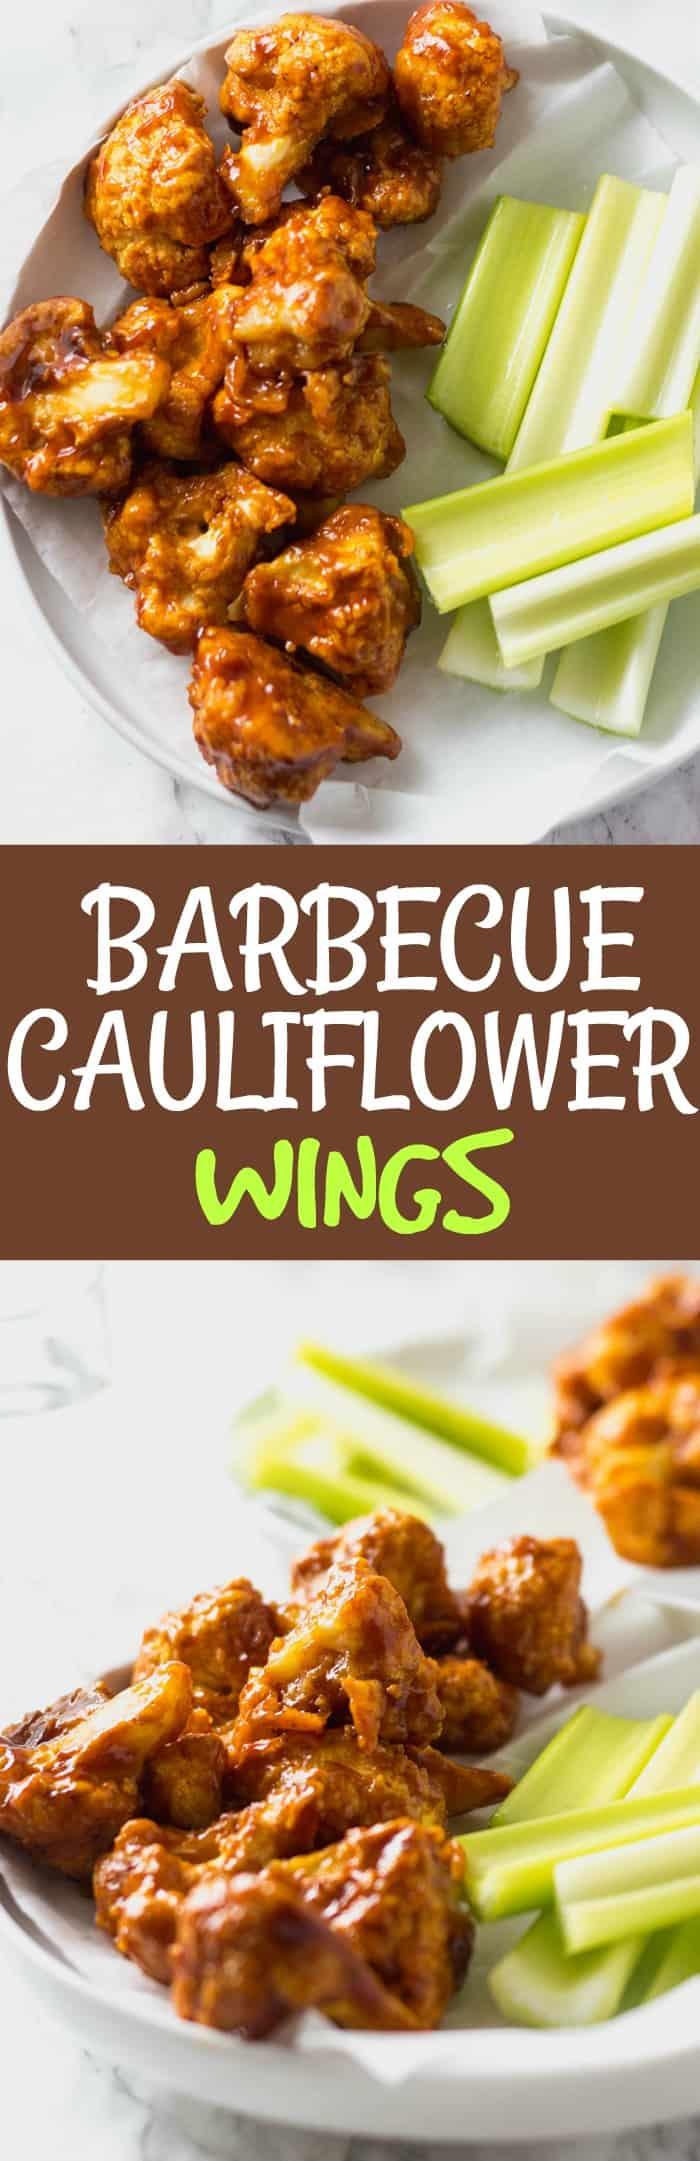 Barbecue Cauliflower Wings Pin